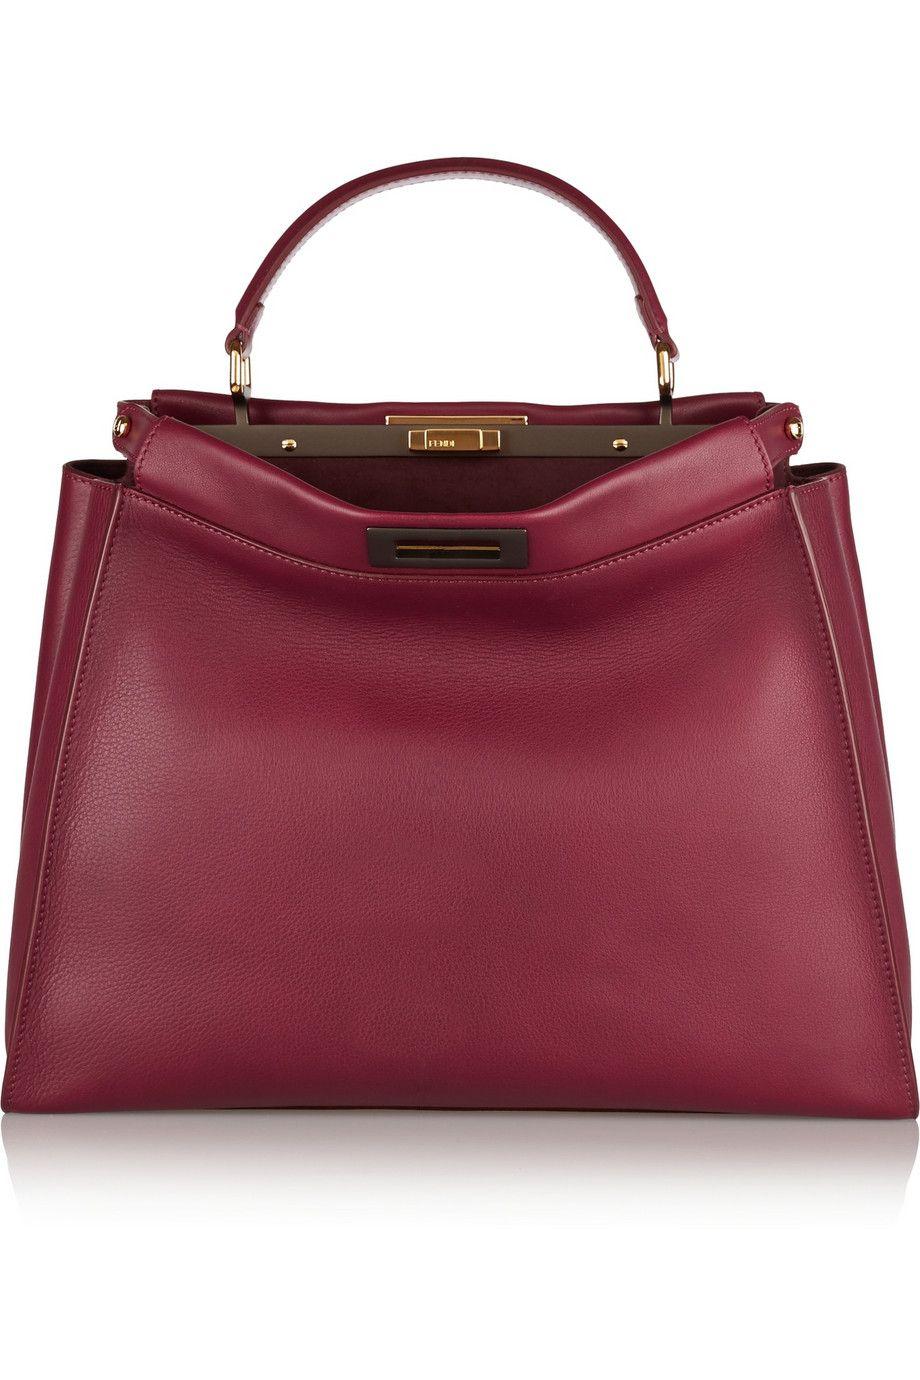 Fendi Peekaboo medium leather tote NET-A-PORTER.COM